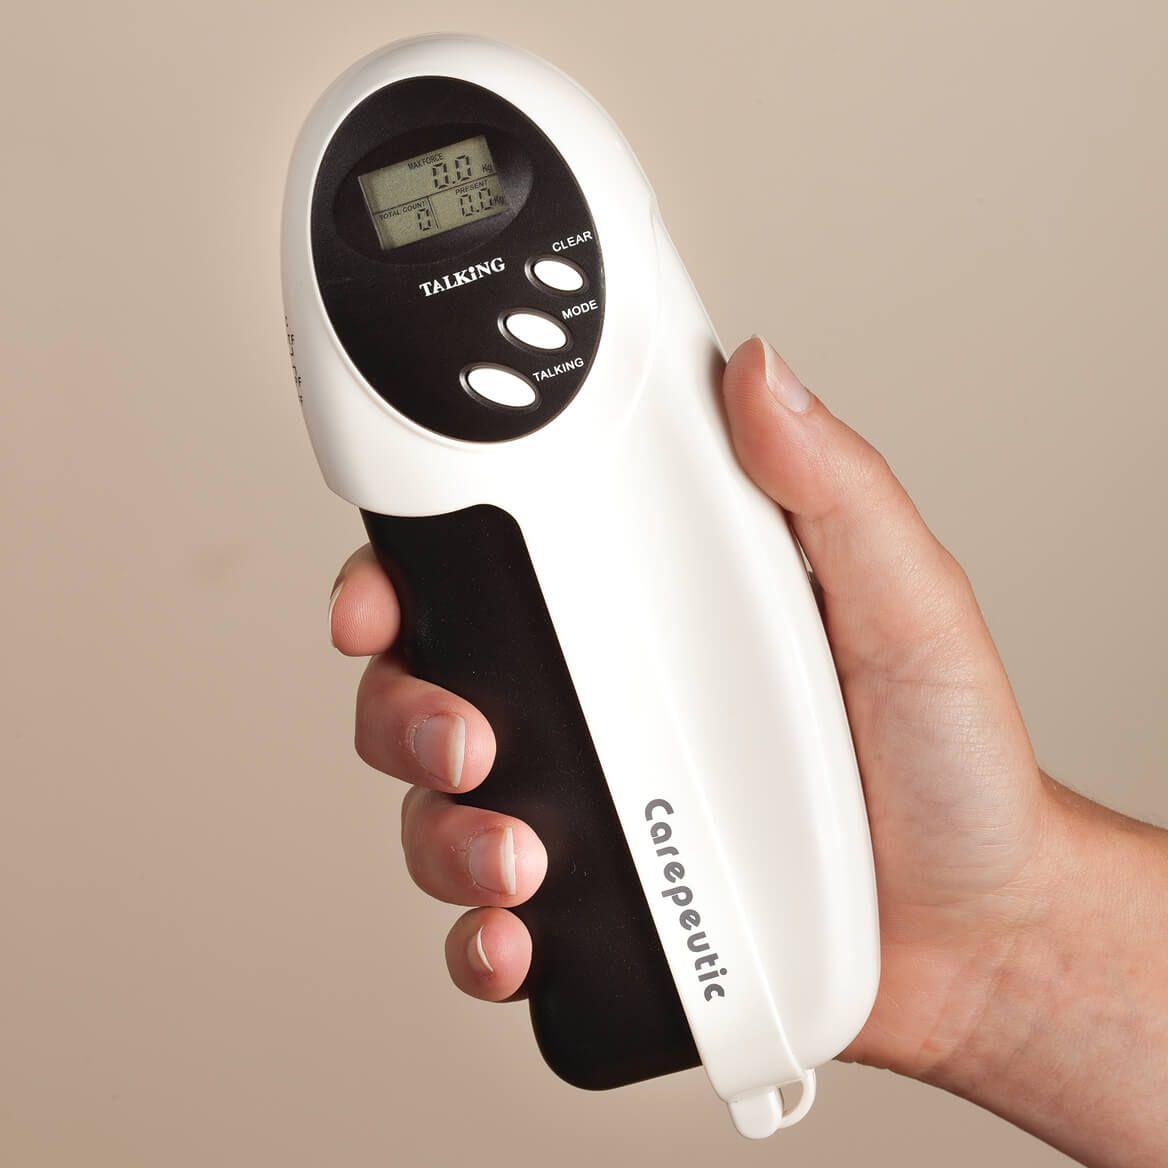 Carepeutic® Talking Power Hand Grip Exerciser-366078